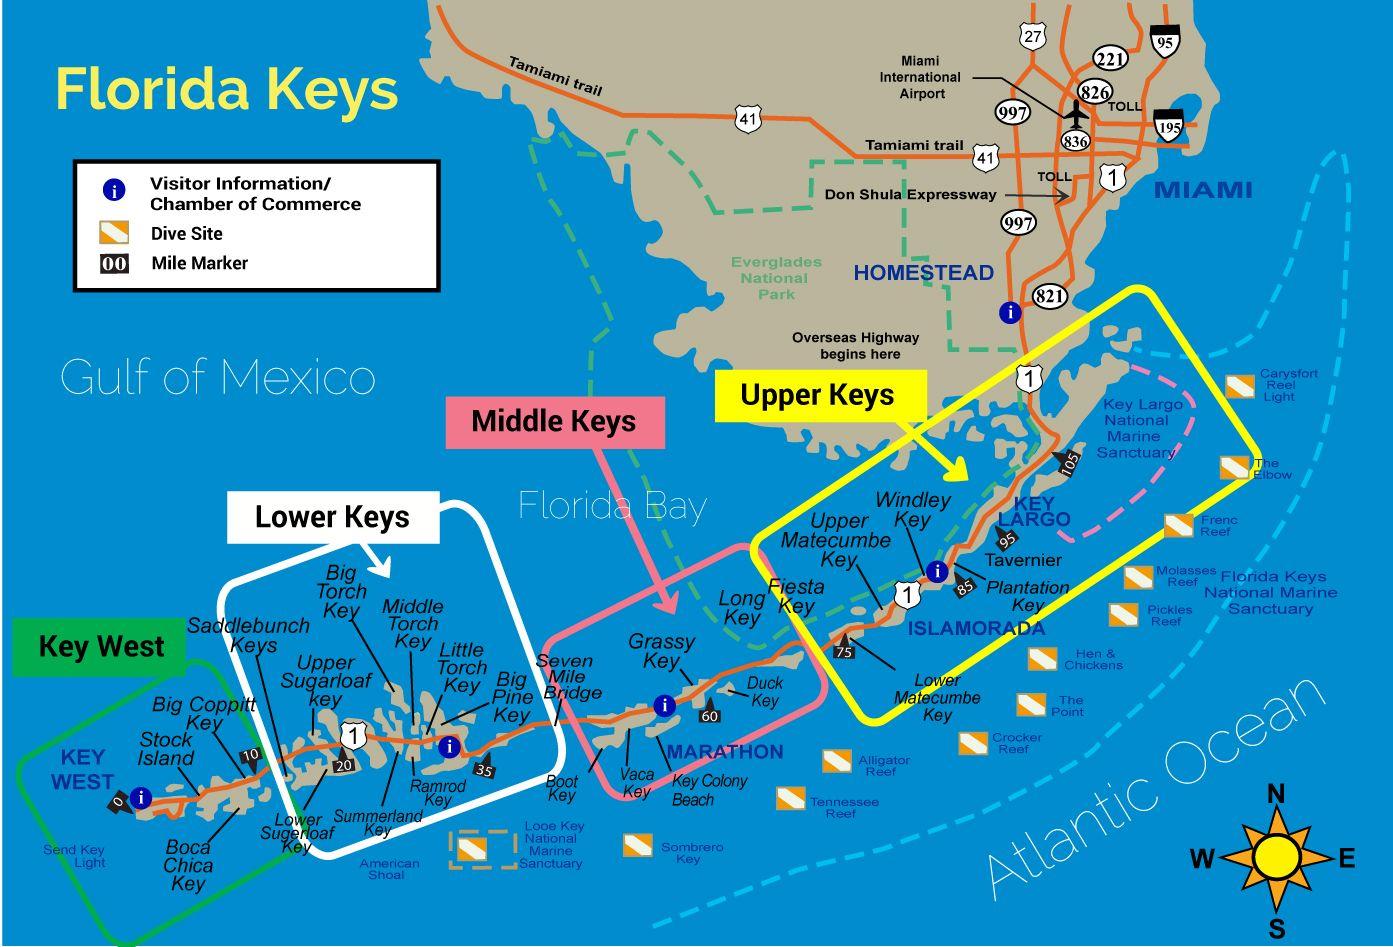 Map Of Areas Servedflorida Keys Vacation Rentals | Vacation - Florida Keys Map